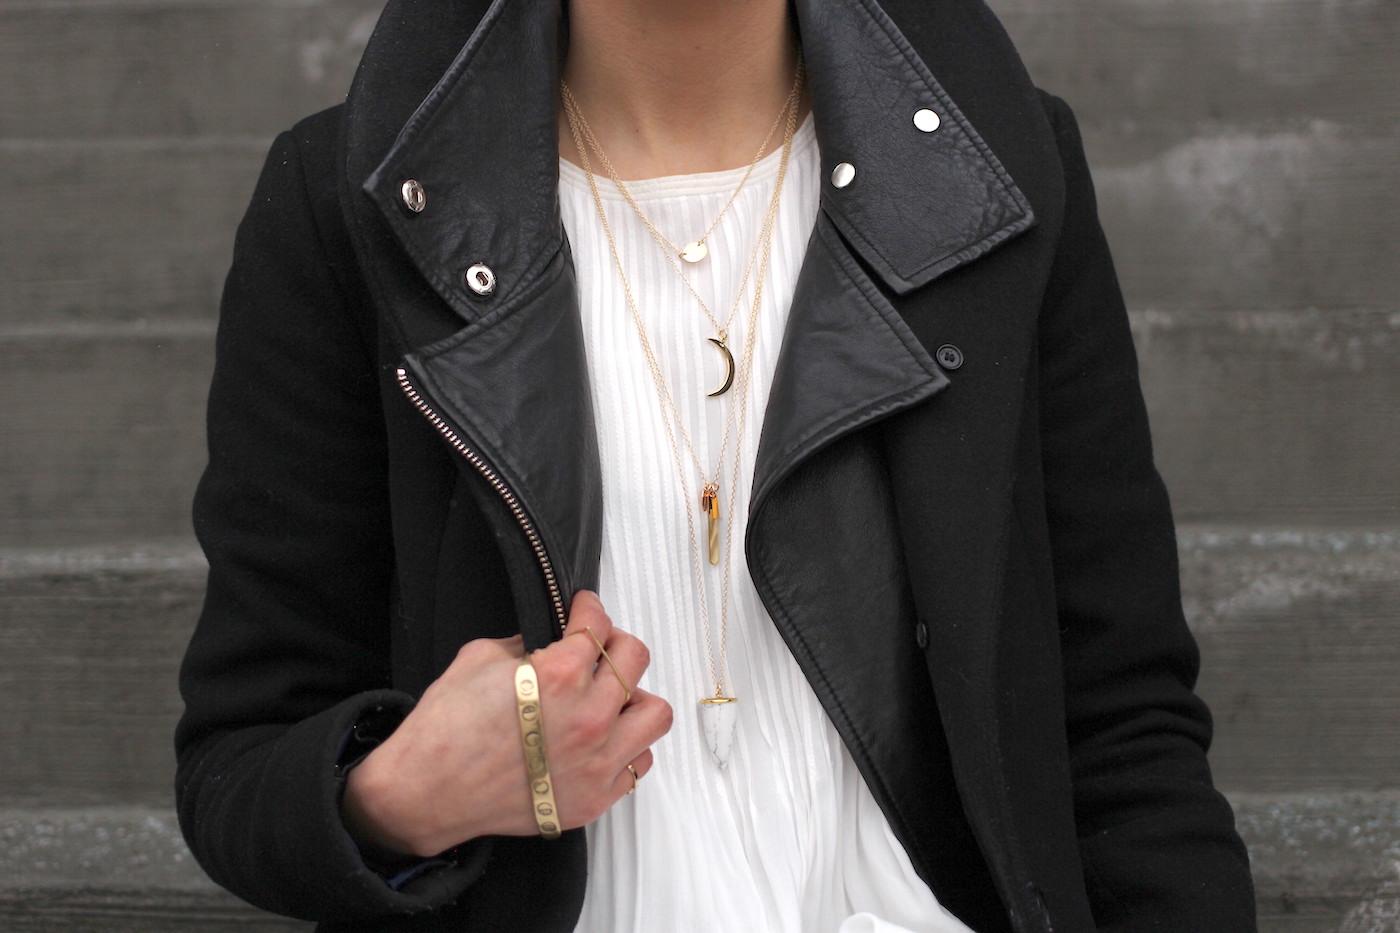 WoahStyle.com | Monochrome dressing with black & white - Lisbeth Jewelry necklaces and Jenny Bird palm cuff